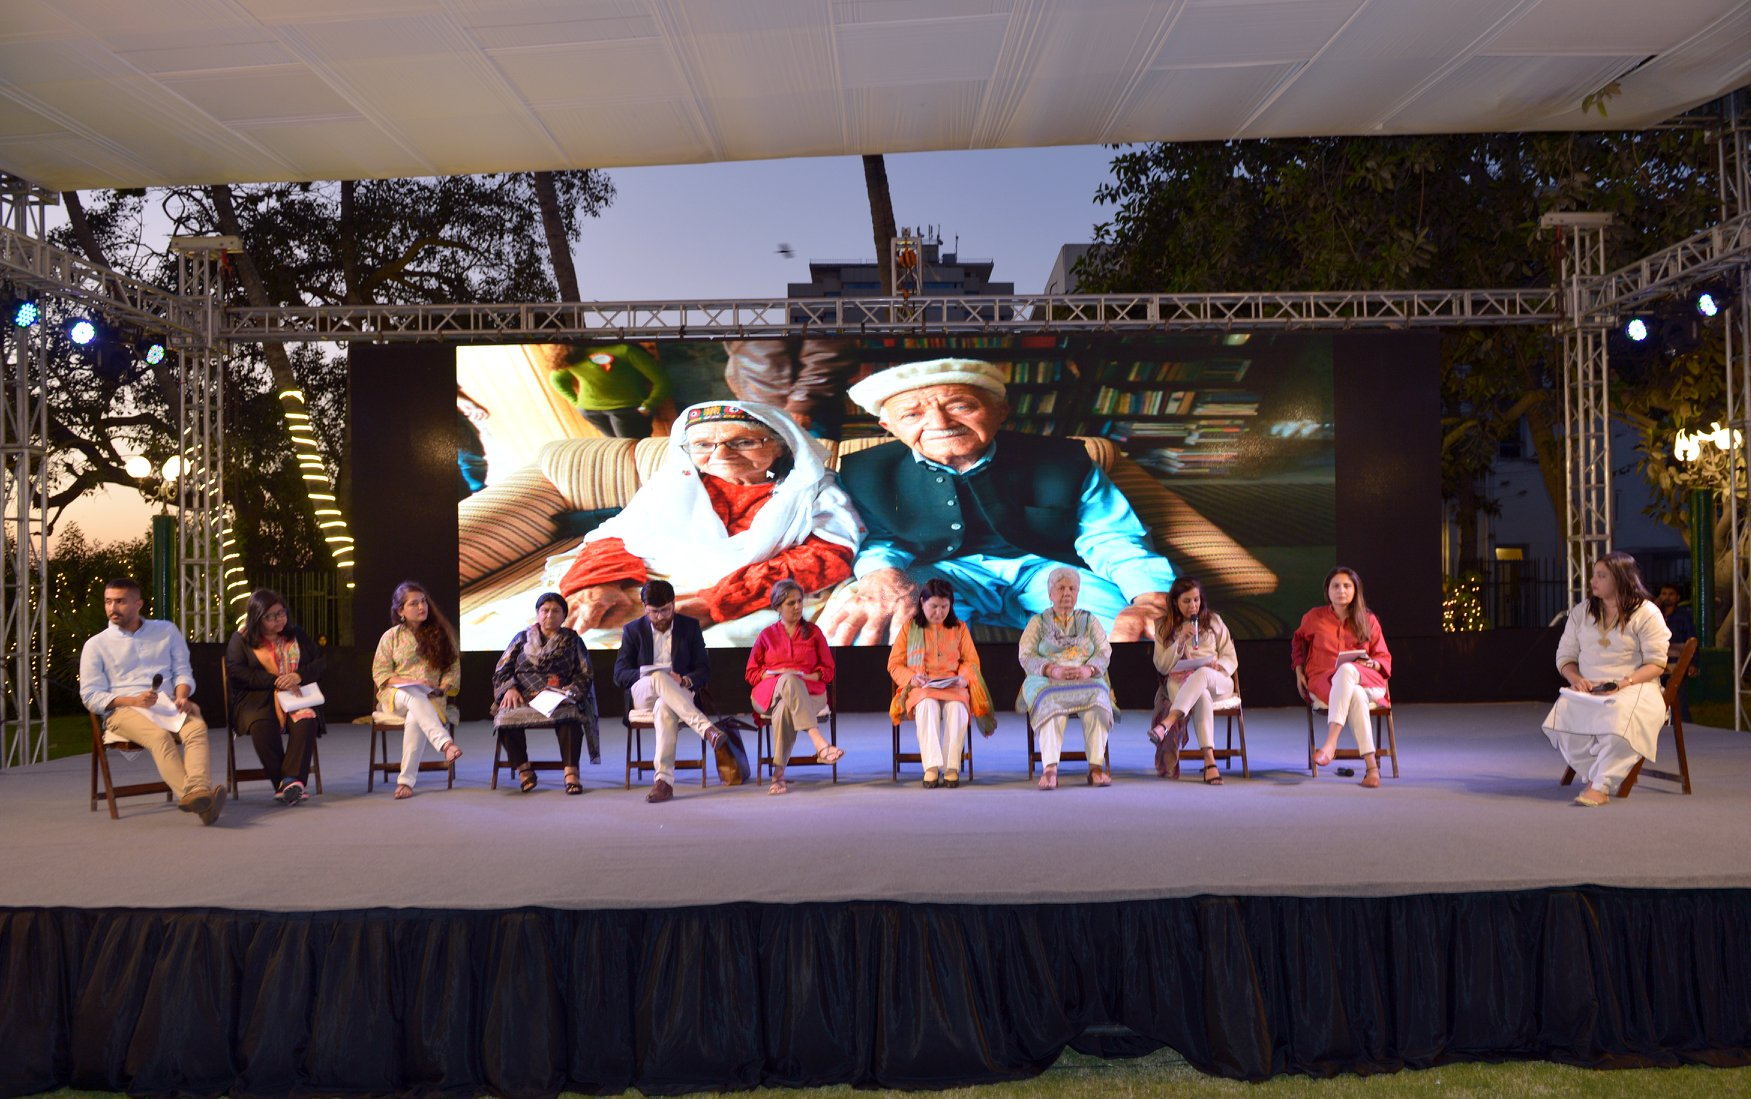 WOW - Women of the World Karachi Thinkin Session was a platform to discuss topics and issues around gender, intersectionality and digital communication heritage, and environment in Pakistan, which will contribute to programming for the main #WOWKhi festival scheduled for Spring 2019. Advisors were Sidra Iqbal Talha Iqbal Mufti Hassaan Khan Yasmin Karim Waqas Johar Maheen Zia Iram S Khan Marvi Mazhar Saima Zaidi Lynette Viccaji Sosan Aziz